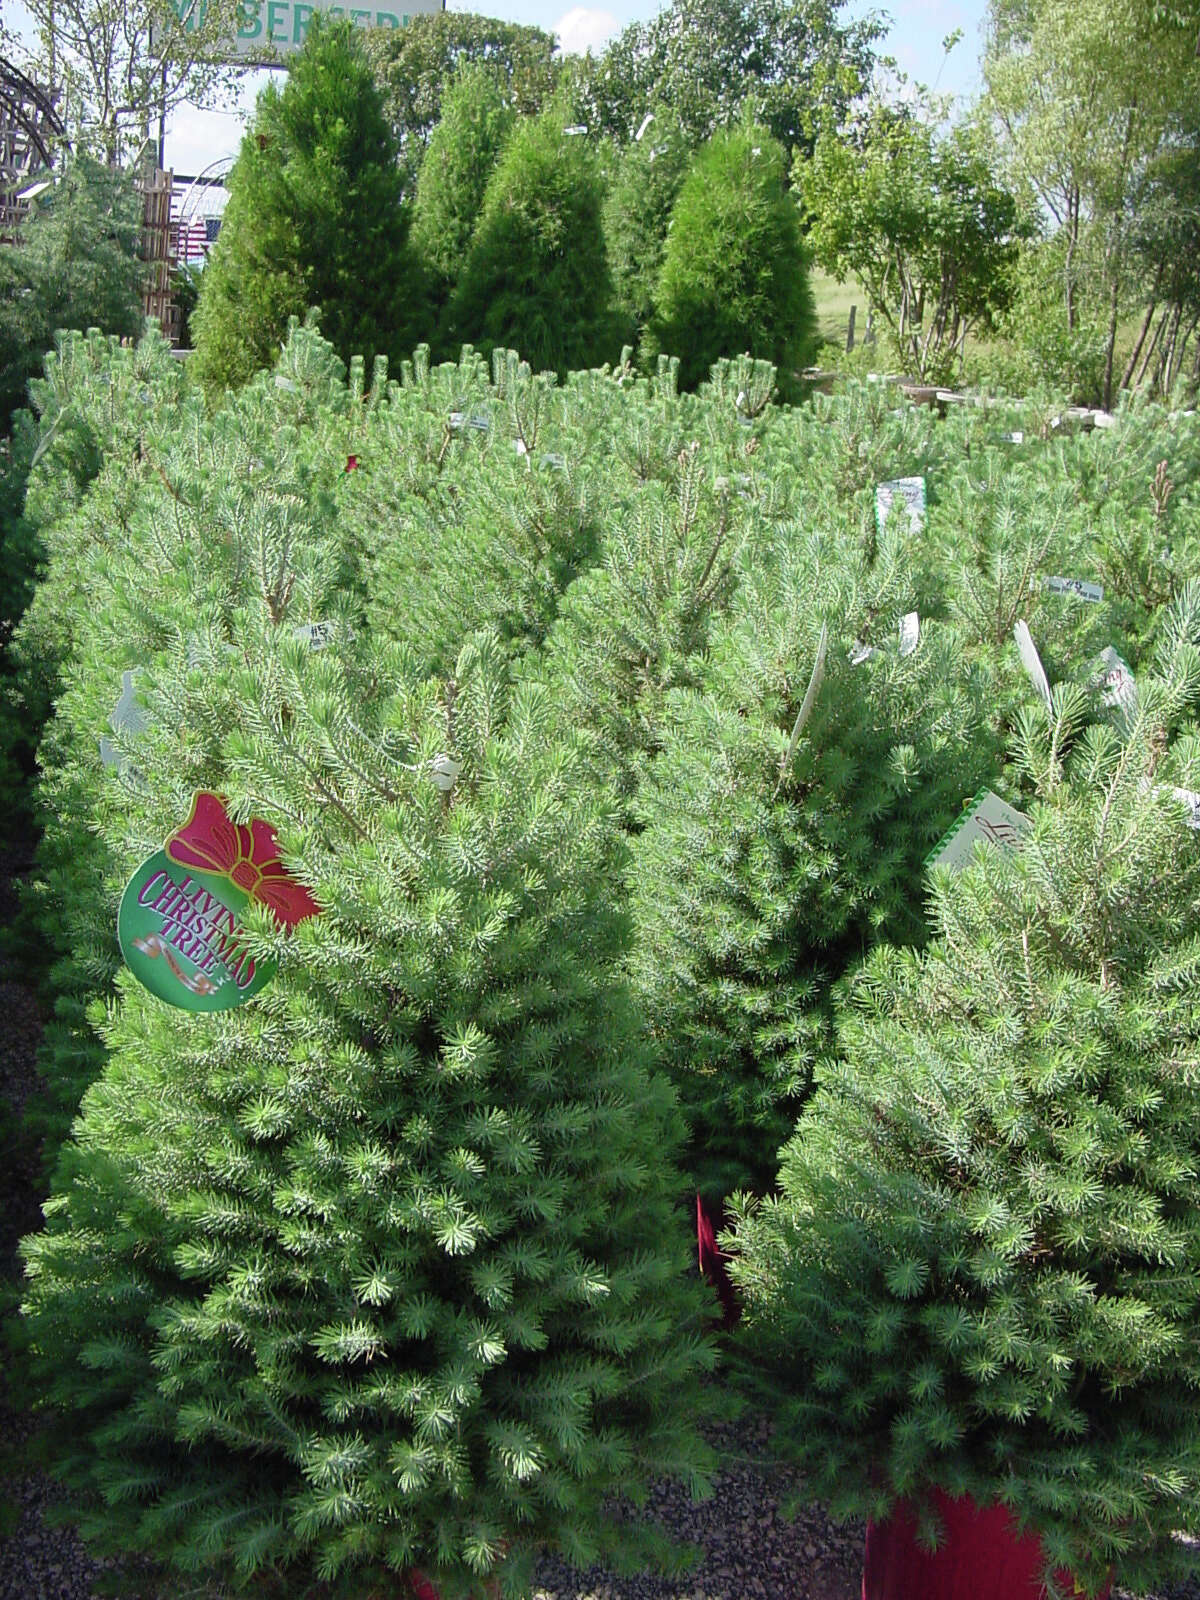 Italian stone pines can grow as tall as 35 feet.